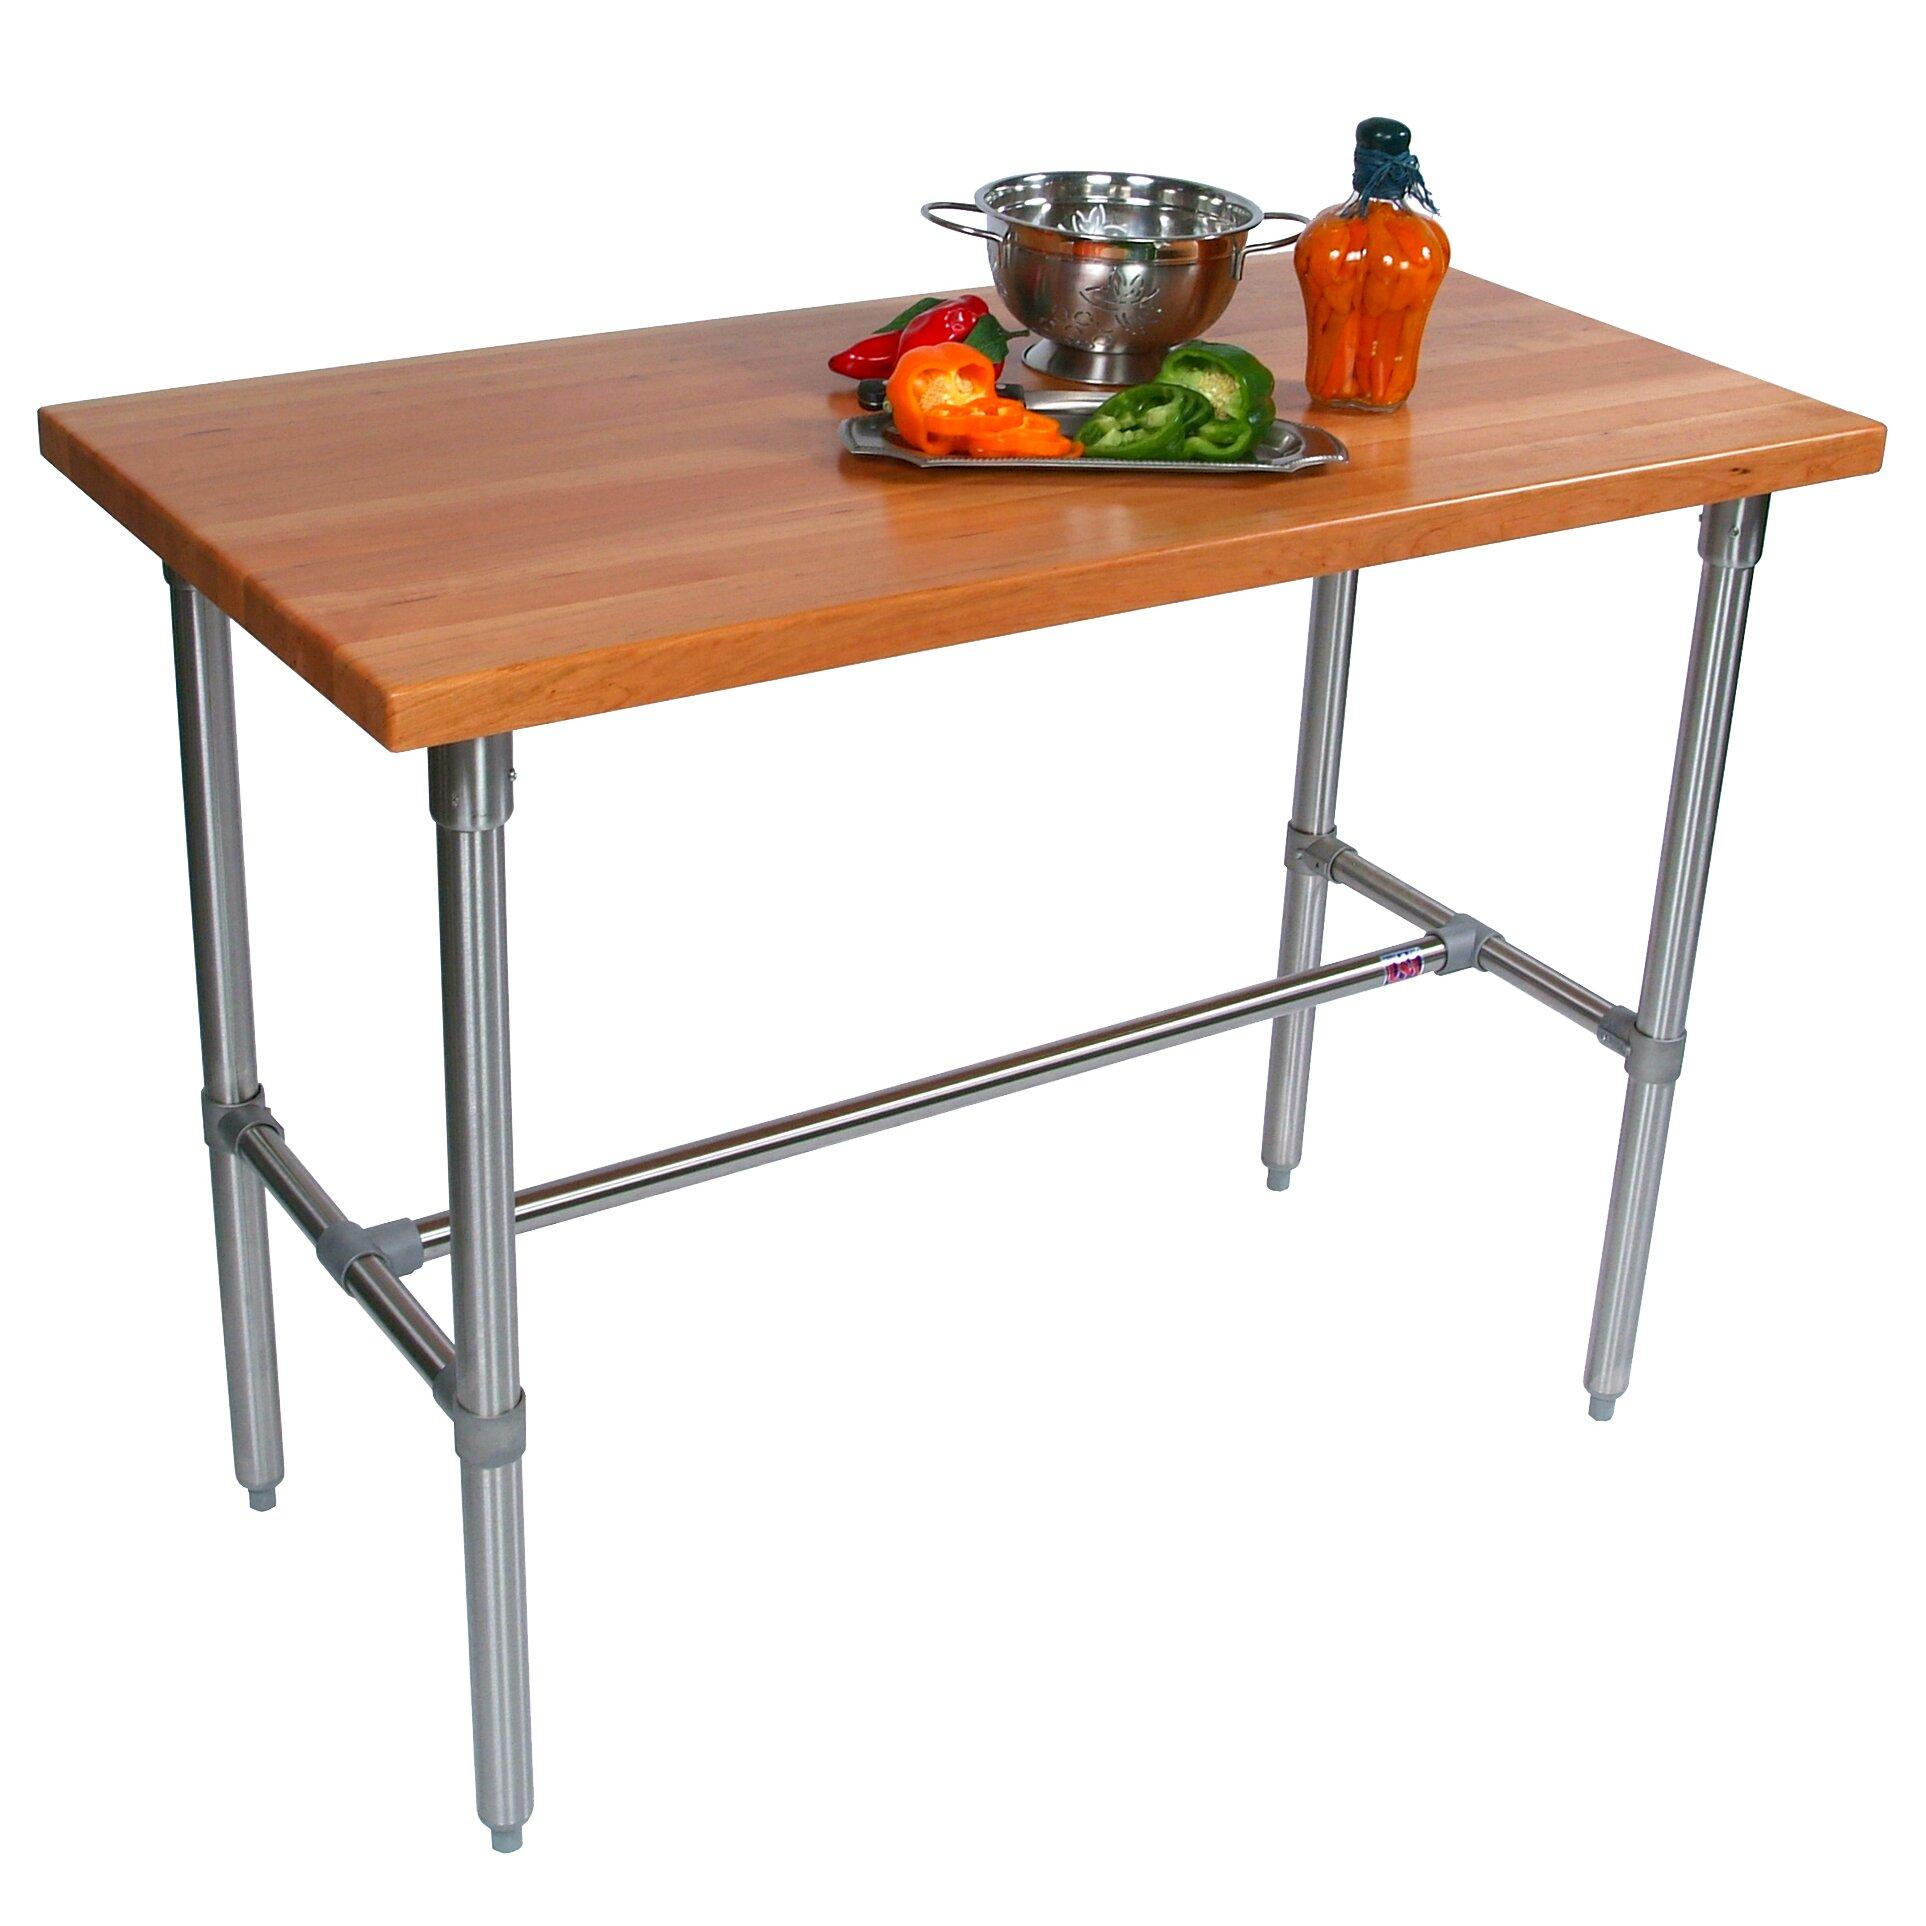 Super John Boos Cucina #5: Cucina+Americana+Counter+Height+Extendable+Dining+Table.jpg